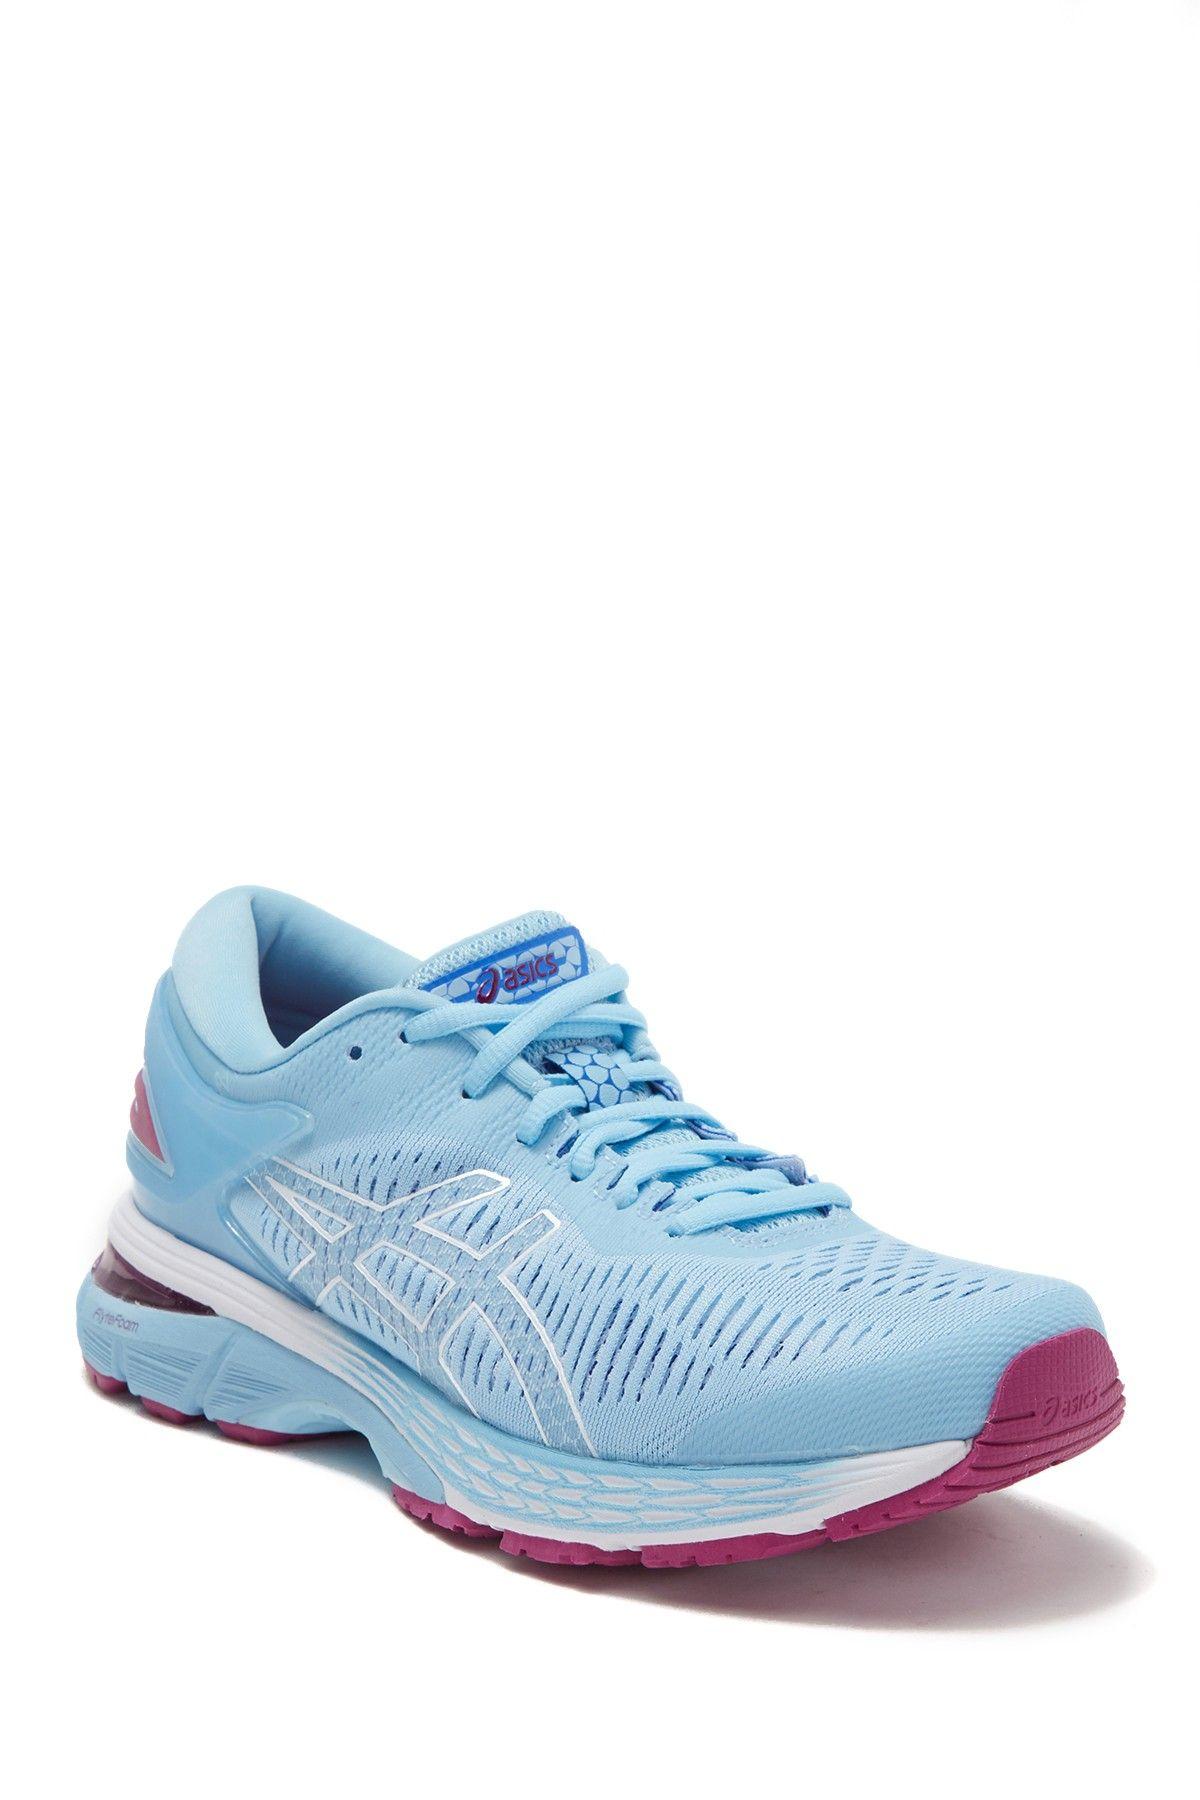 Asics Gel Kayano 25 Running Sneaker Nordstrom Rack Womens Running Shoes Running Sneakers Sneakers